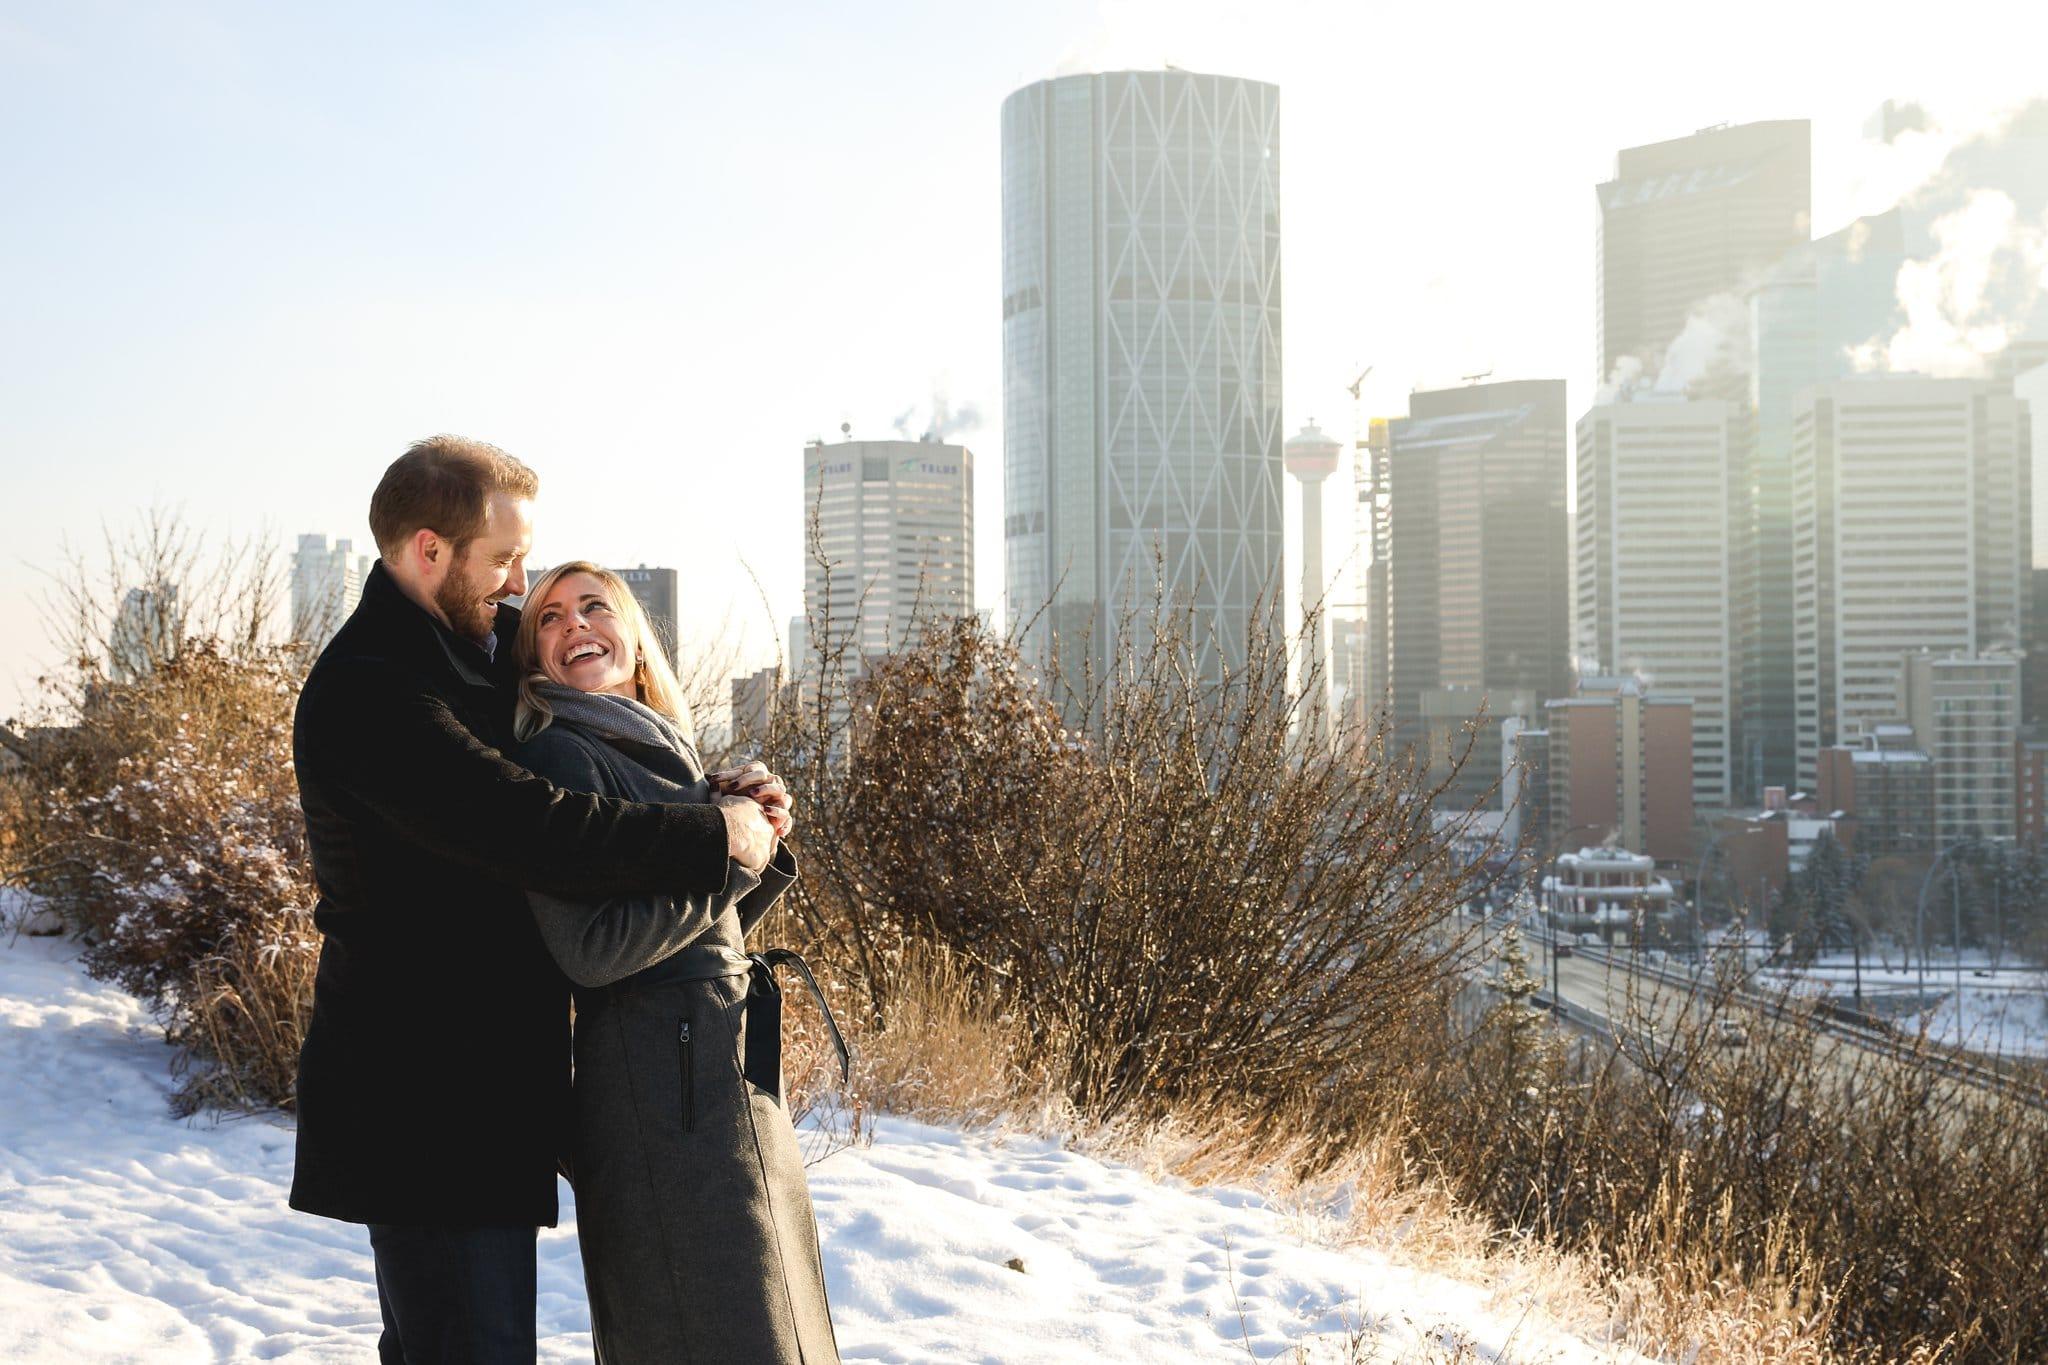 Ashley Daphne Photography Calgary Couple Wedding Photographer Engagement Photos Proposal Photos_0019.jpg